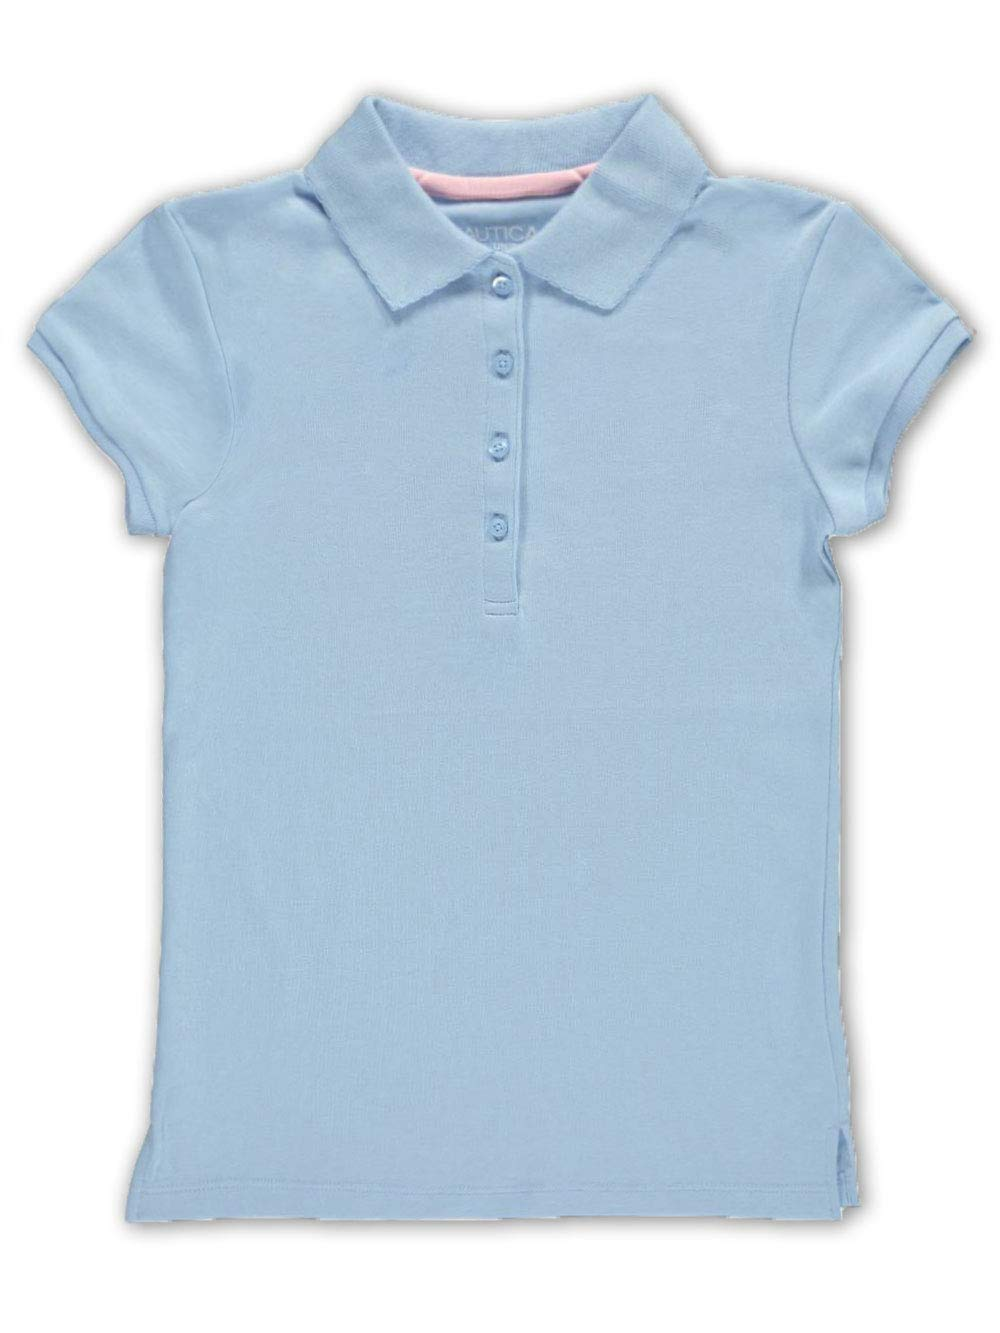 Nautica Girls' Short Sleeve Polo,Light Blue,Medium(8/10) by Nautica